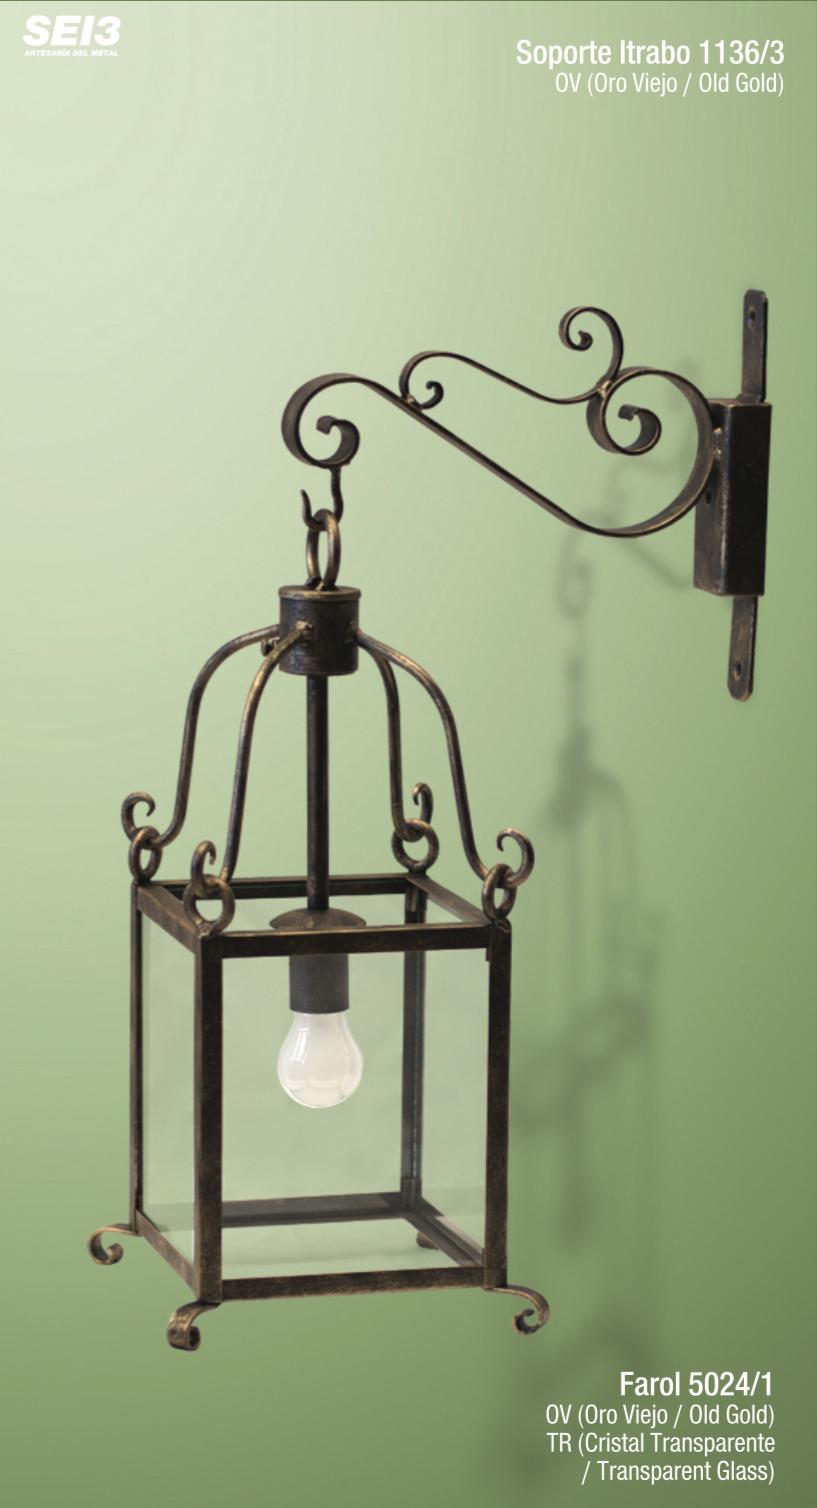 Faroles y apliques de interior sei3 iluminaci n artesanal for Disenos de faroles